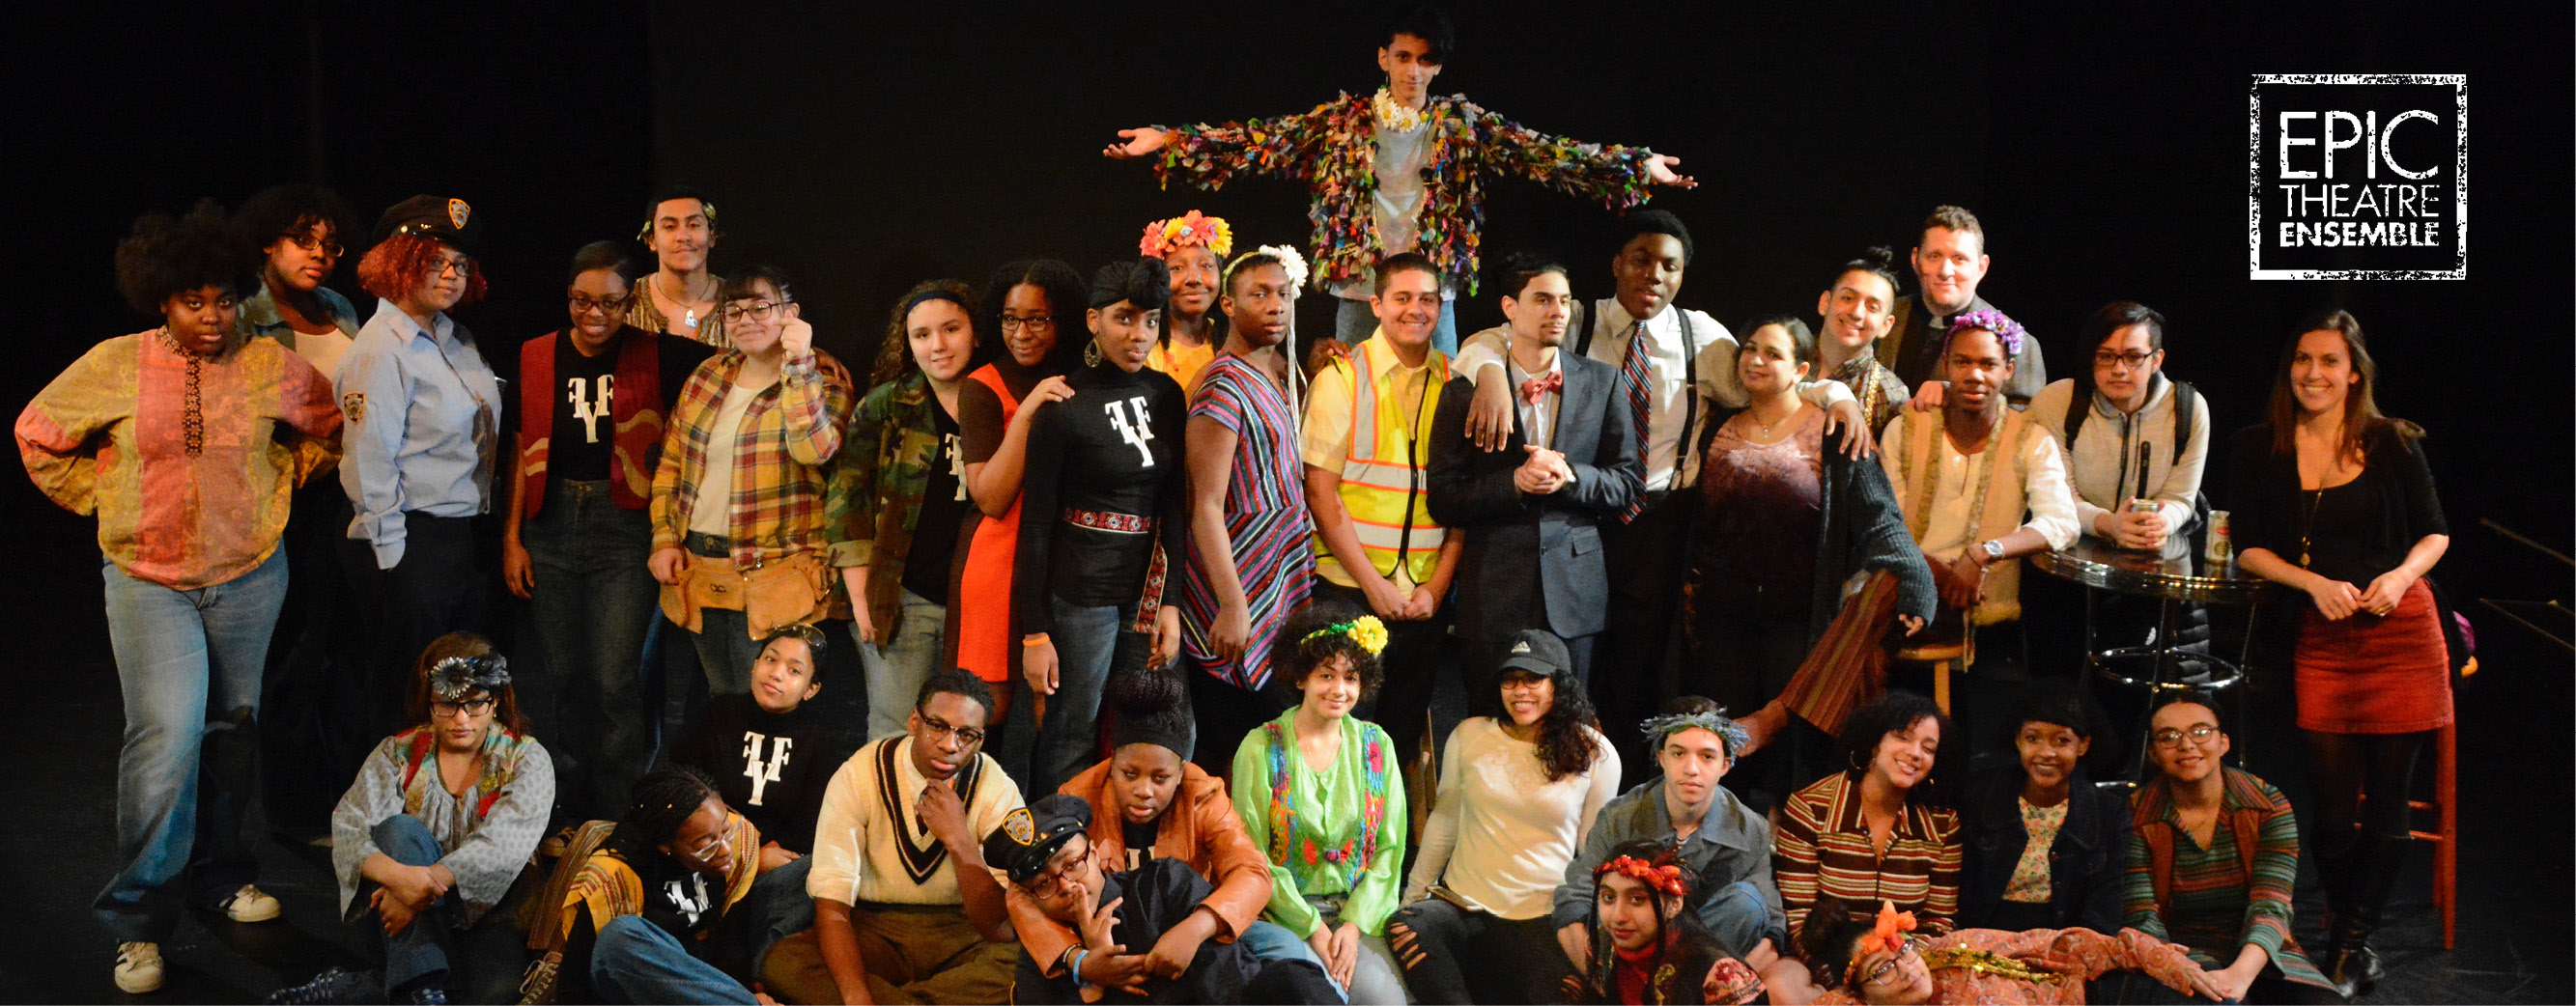 International festival of amateur theatricals